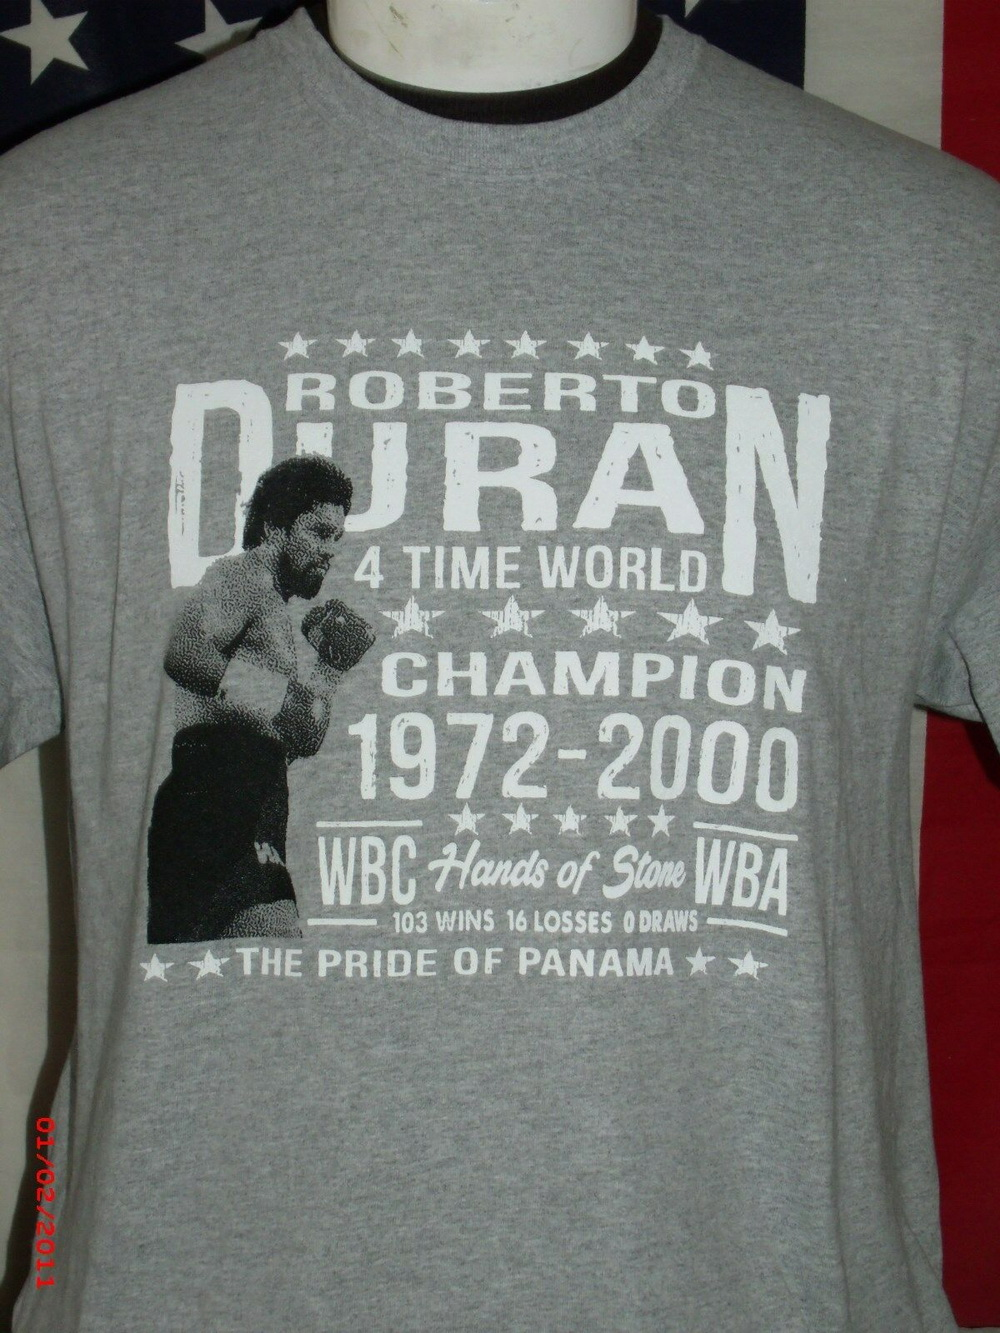 Roberto Duran Boxing Shirt Trinidad Puerto Rico Latin Boxers Sportswear Men Tops Tee Shirt